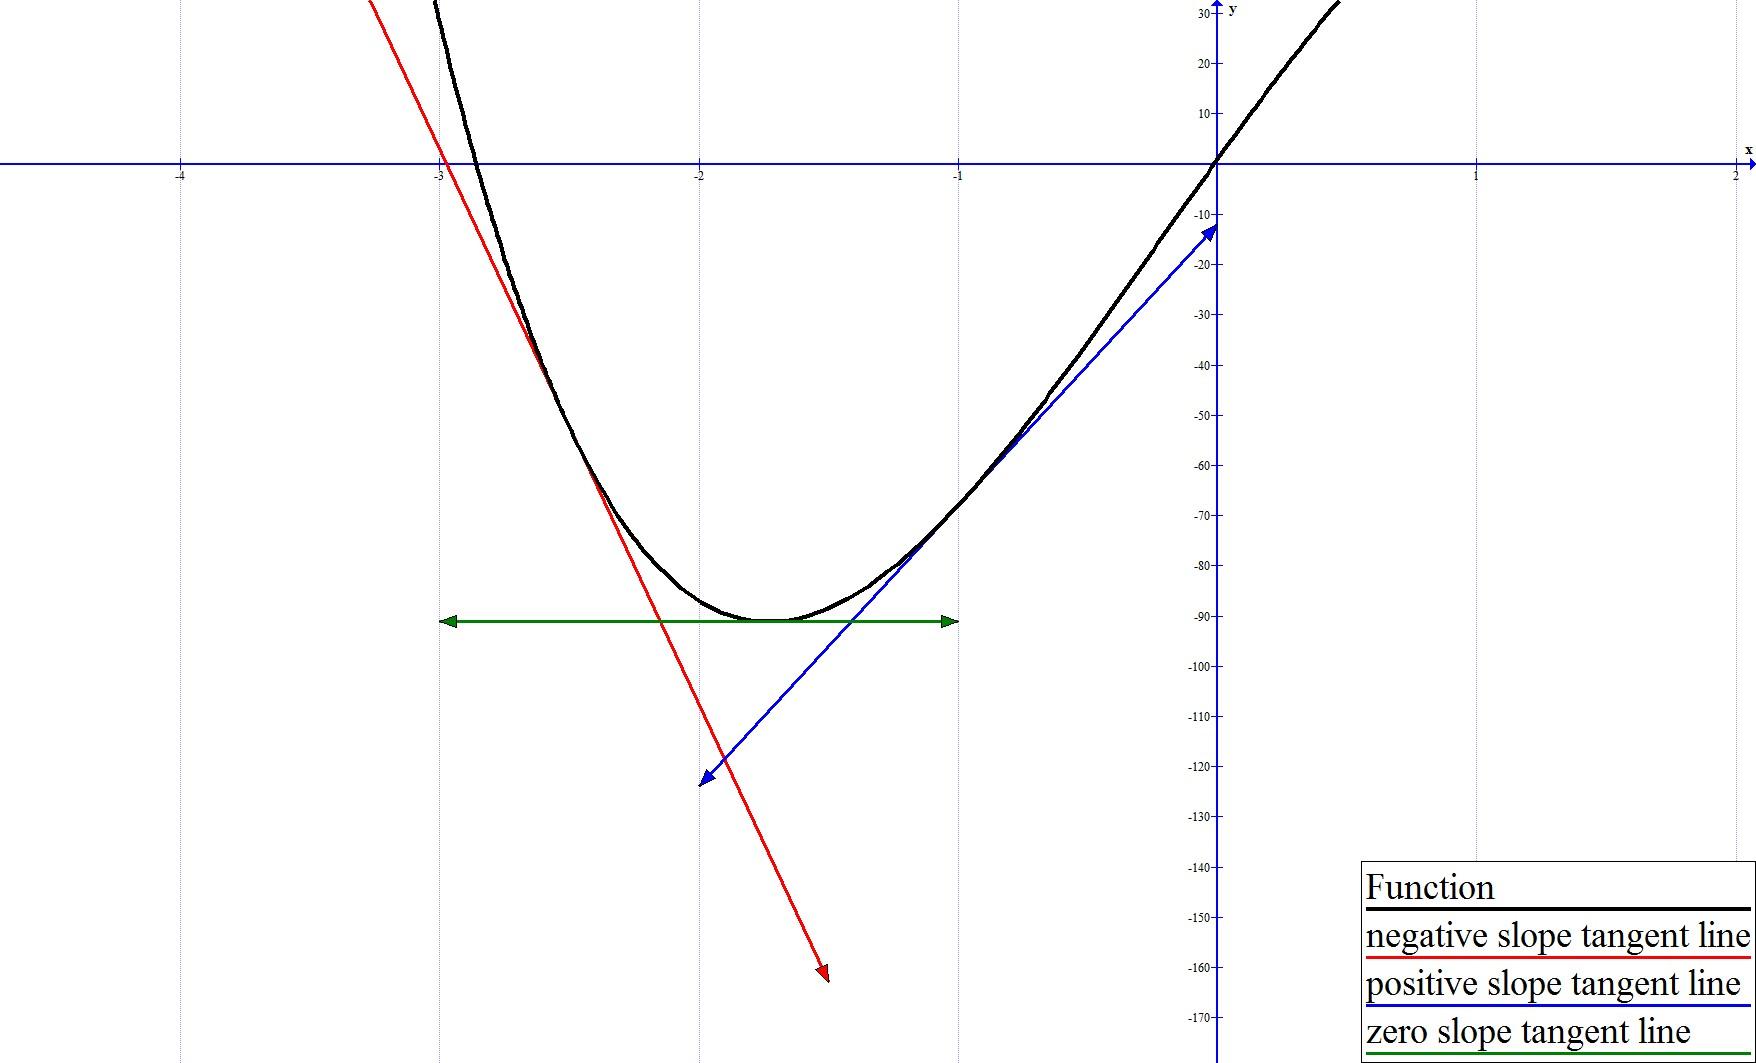 Horizontal tangent line 2